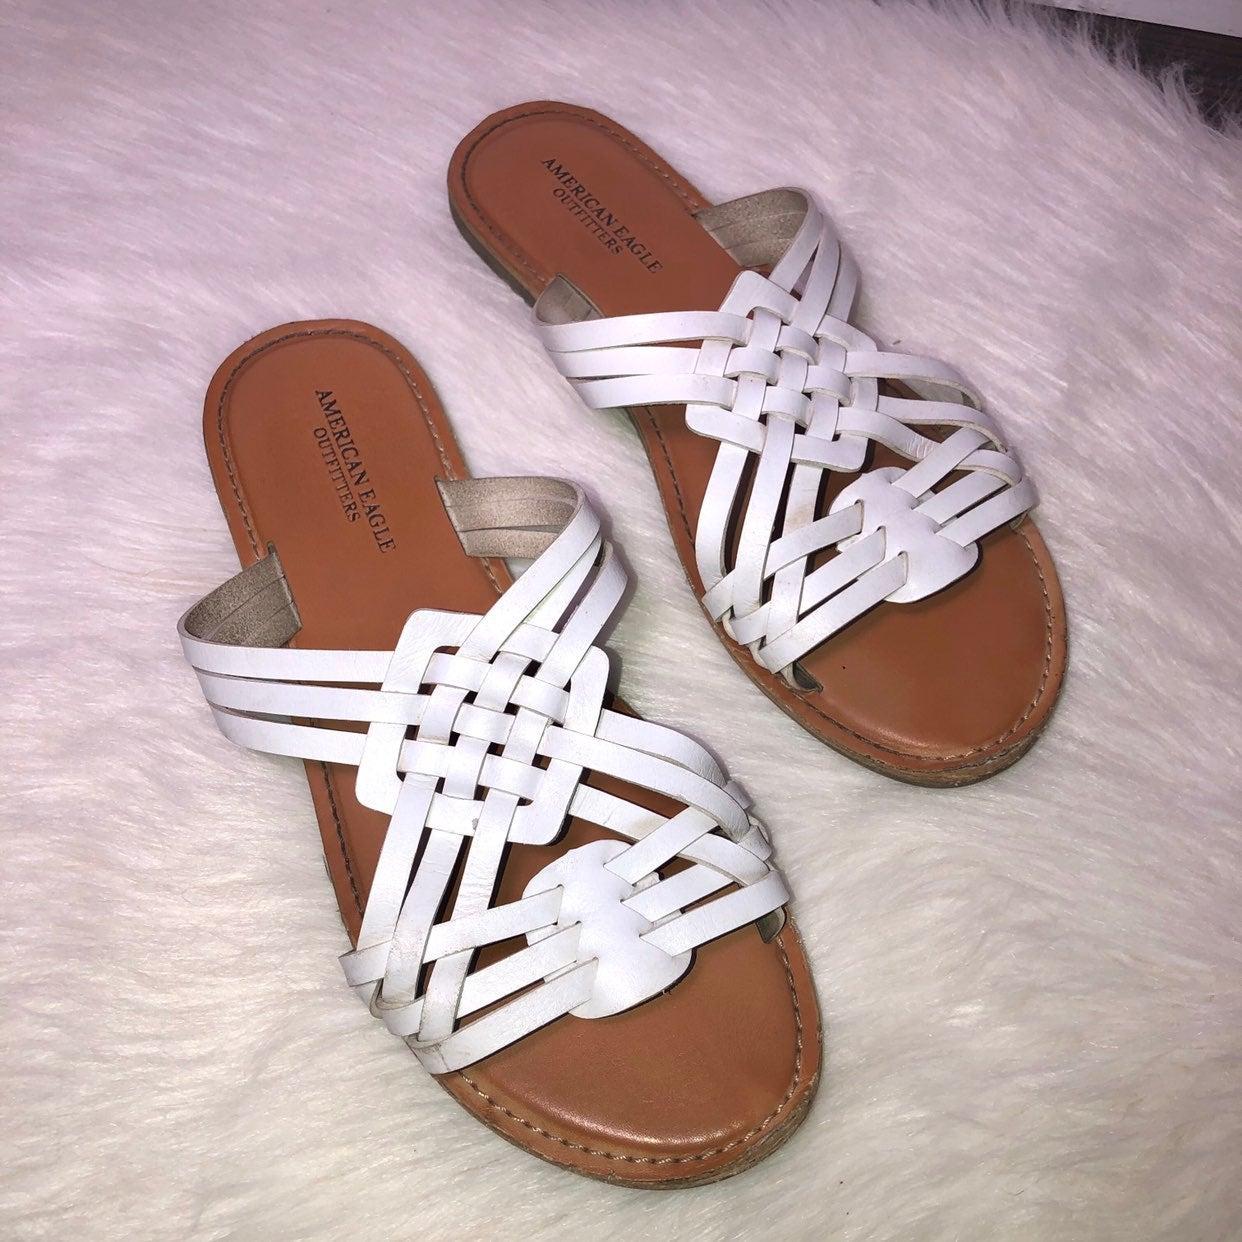 American Eagle leather slip on sandals